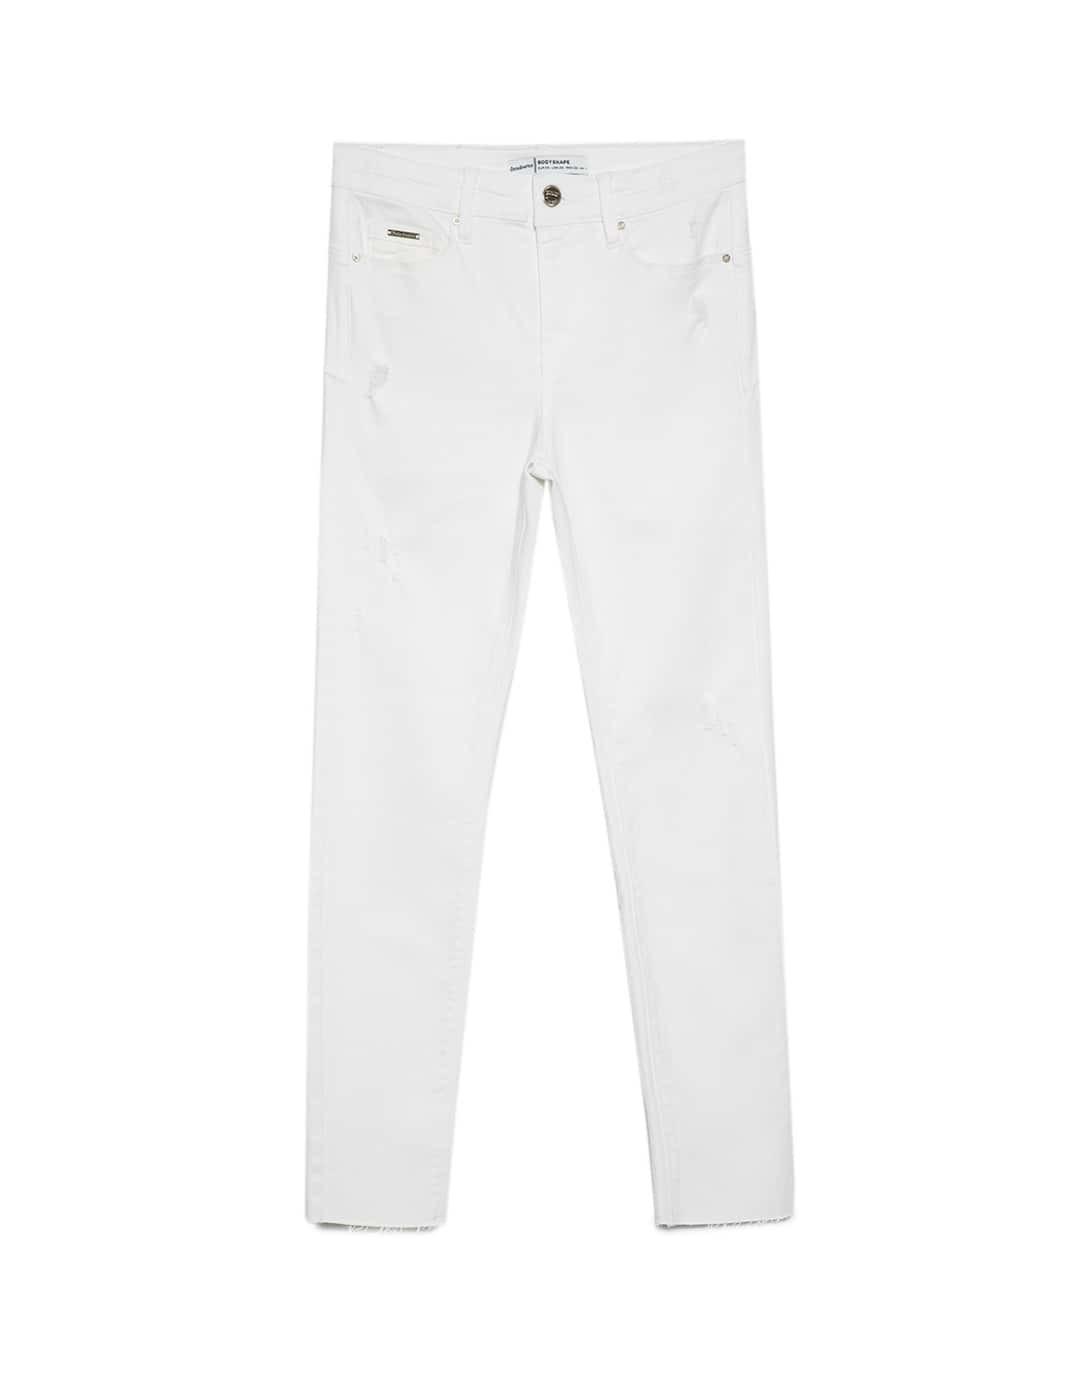 Jeans blancos demin  25,99 euros.